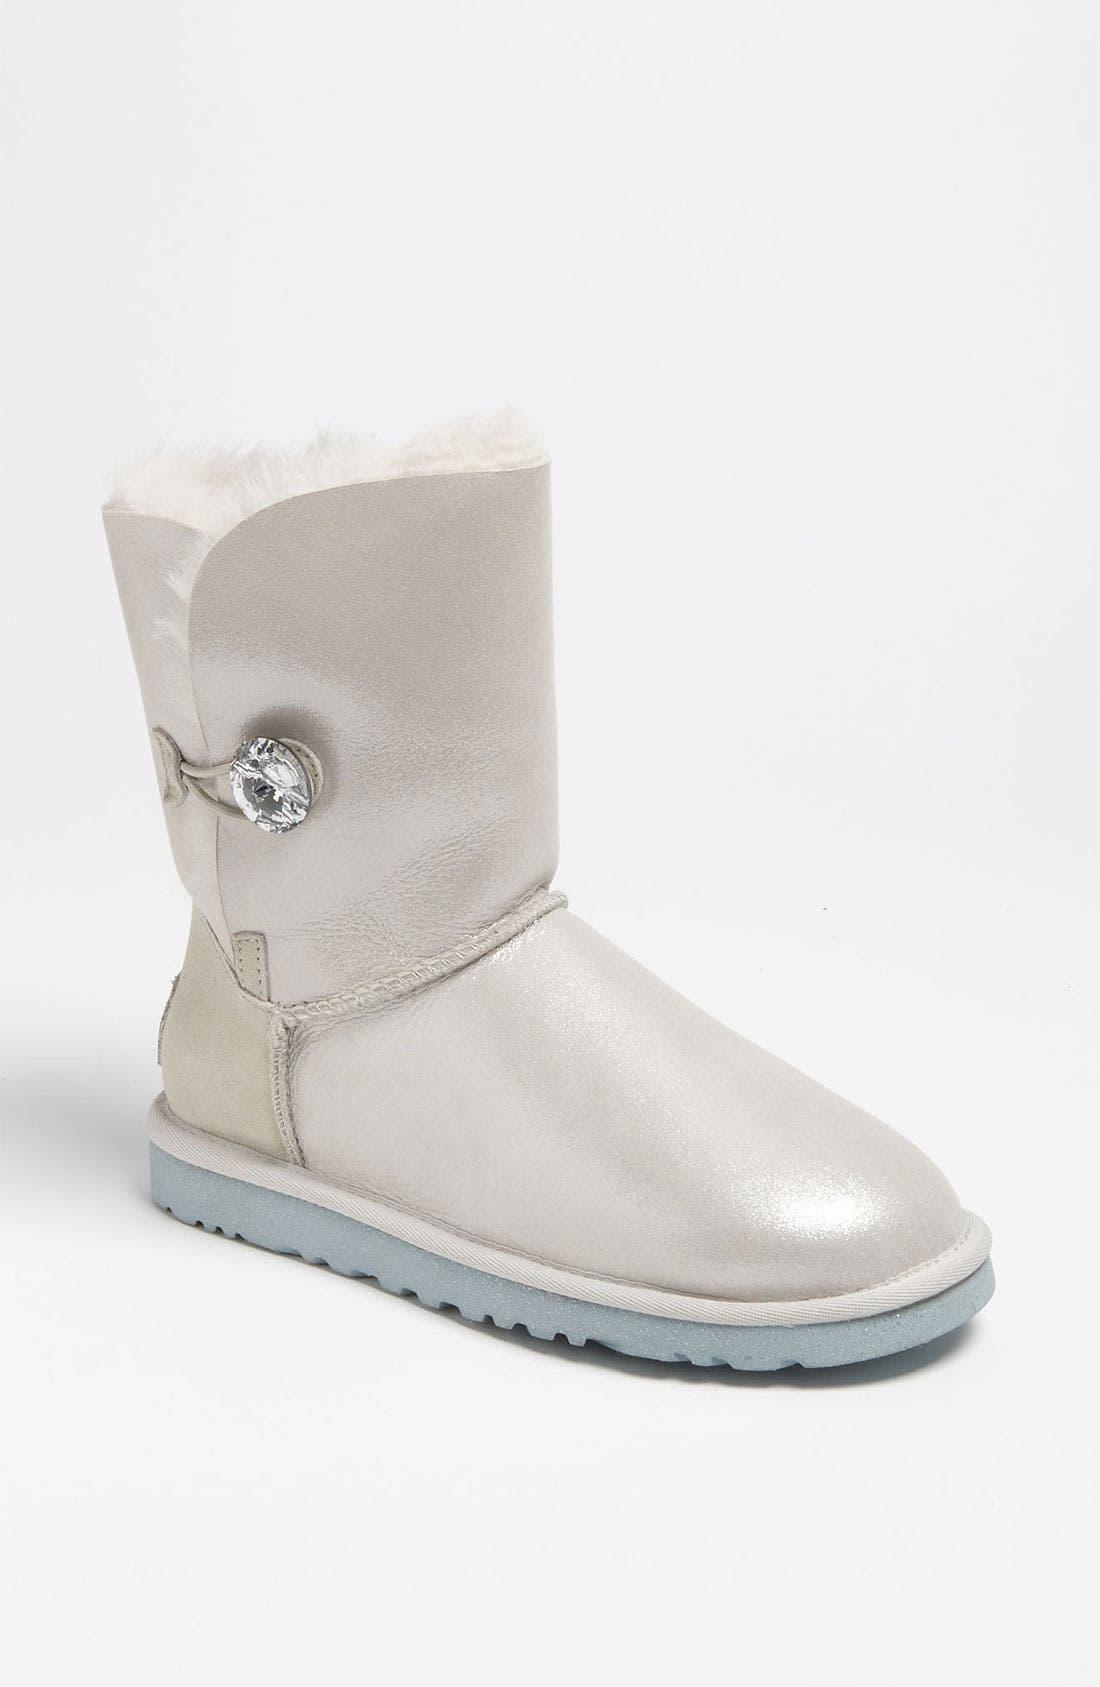 Alternate Image 1 Selected - UGG® Australia 'Bailey Button - I Do' Boot (Women)